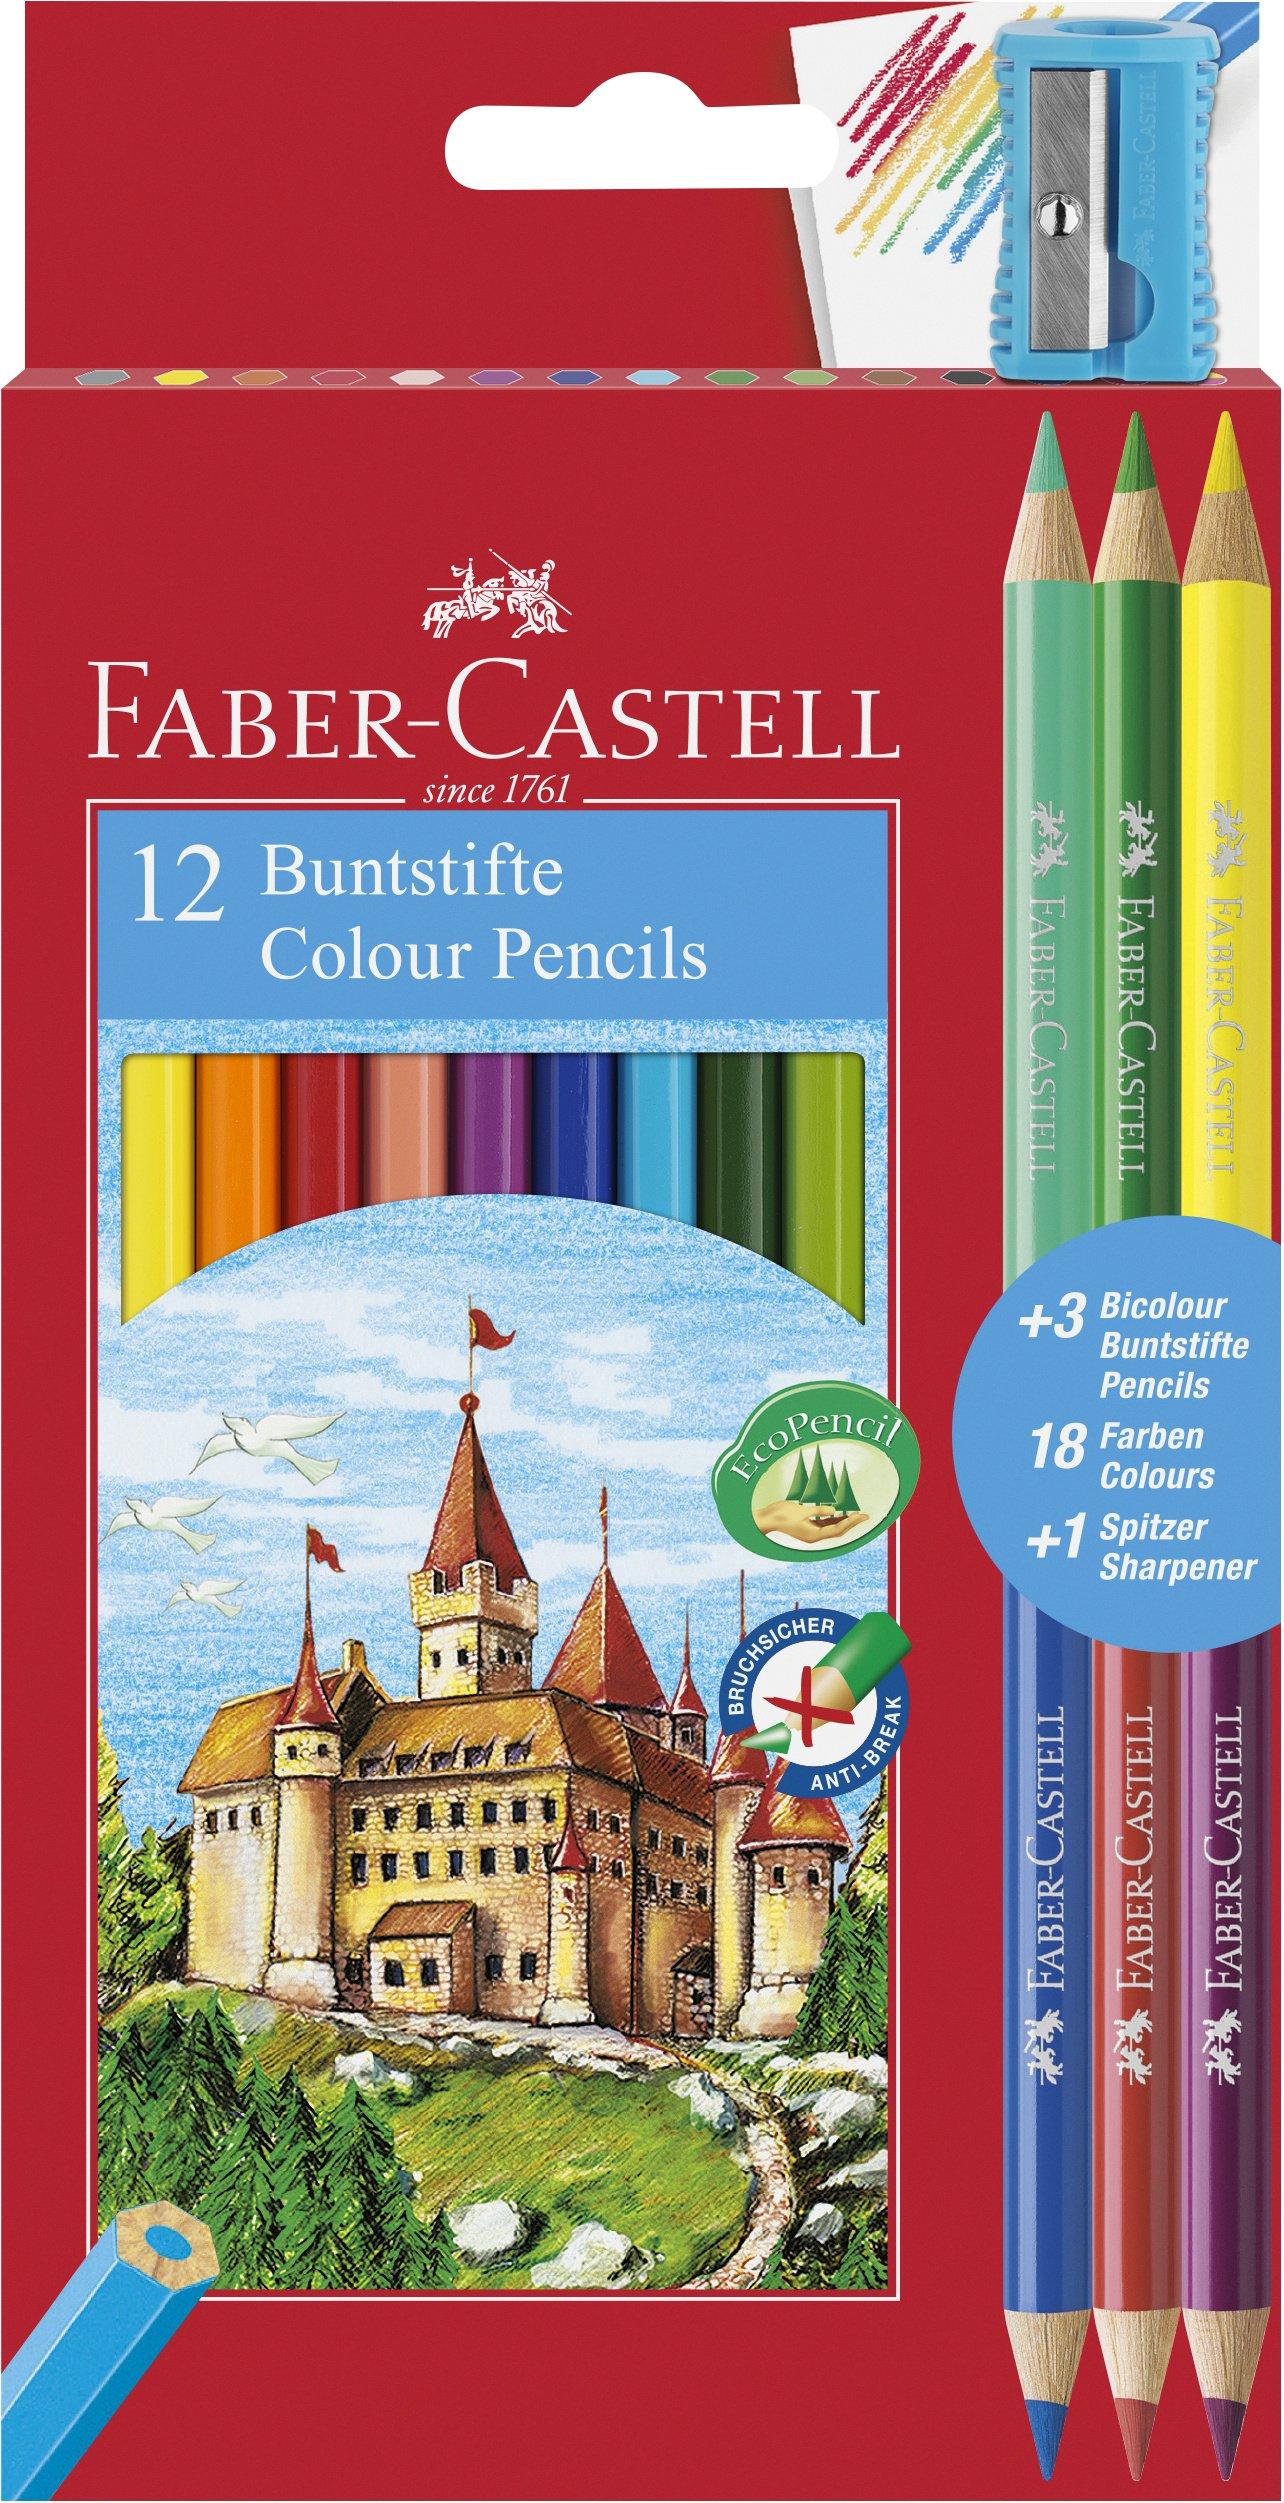 Estuche promoción 12 lápices color  hexagonales + 3 lápices bicolor redondos,  18 colores surtidos